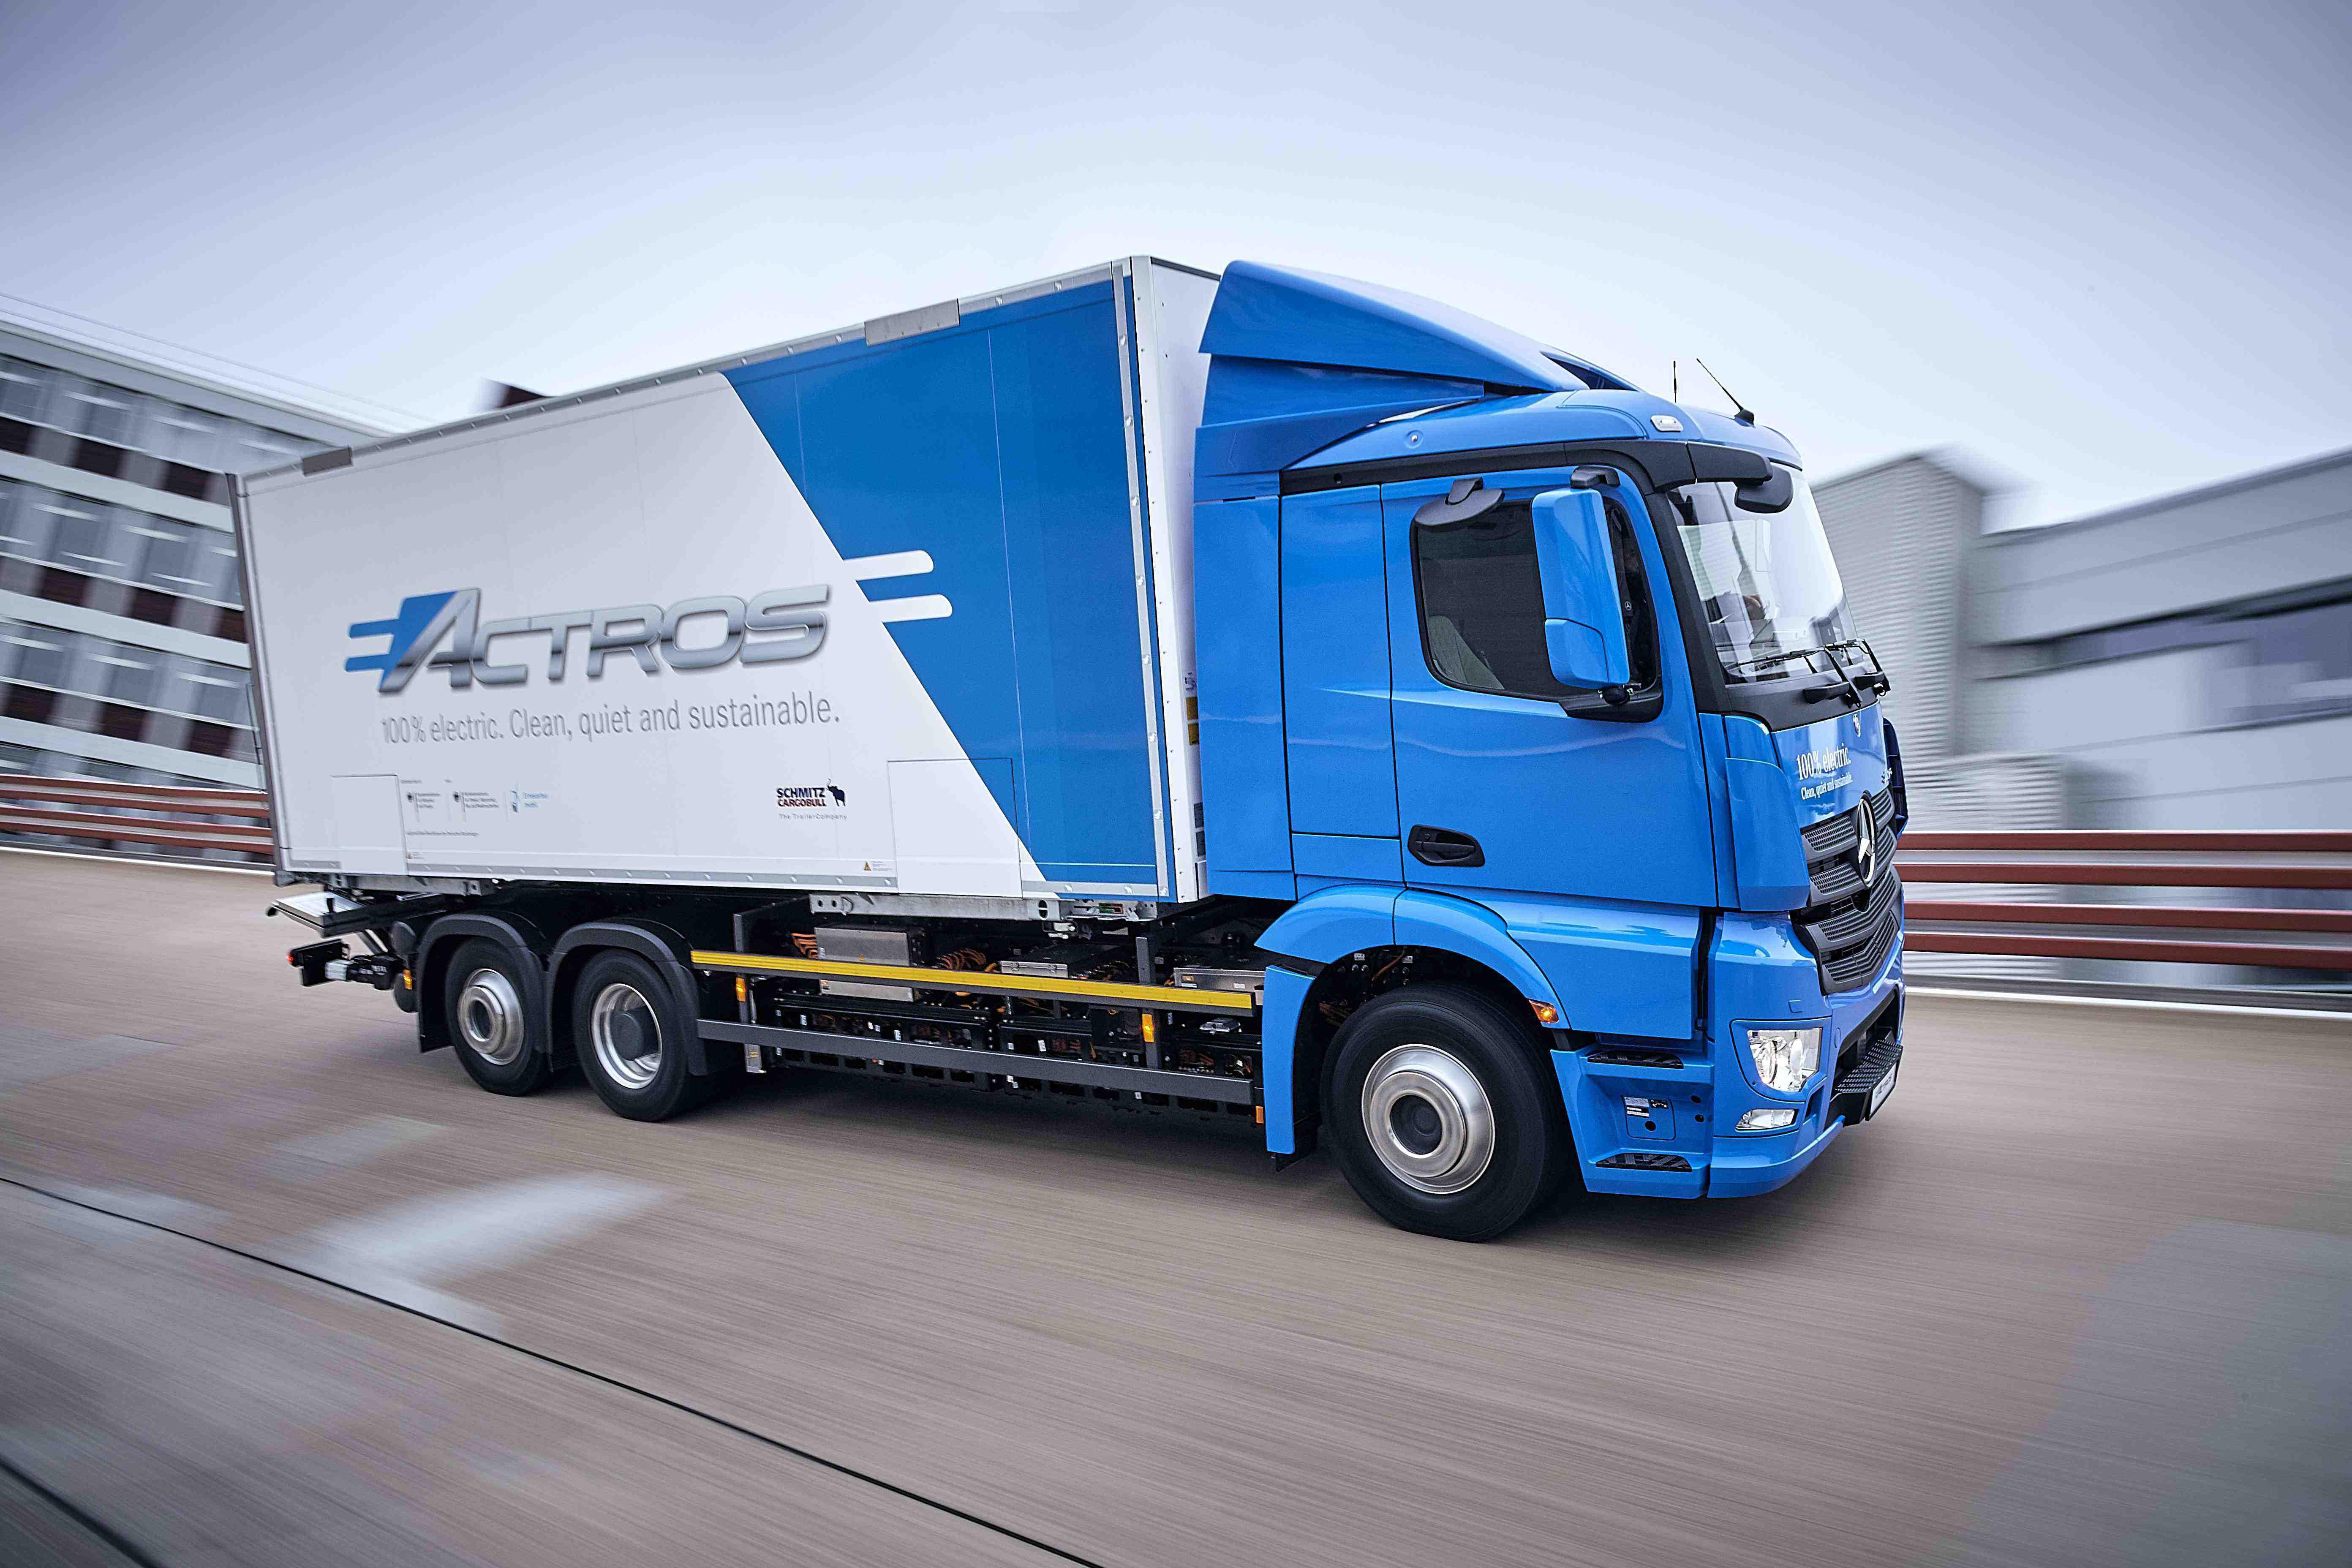 Mercedes all-electric eActros trucks to undergo fleet testing